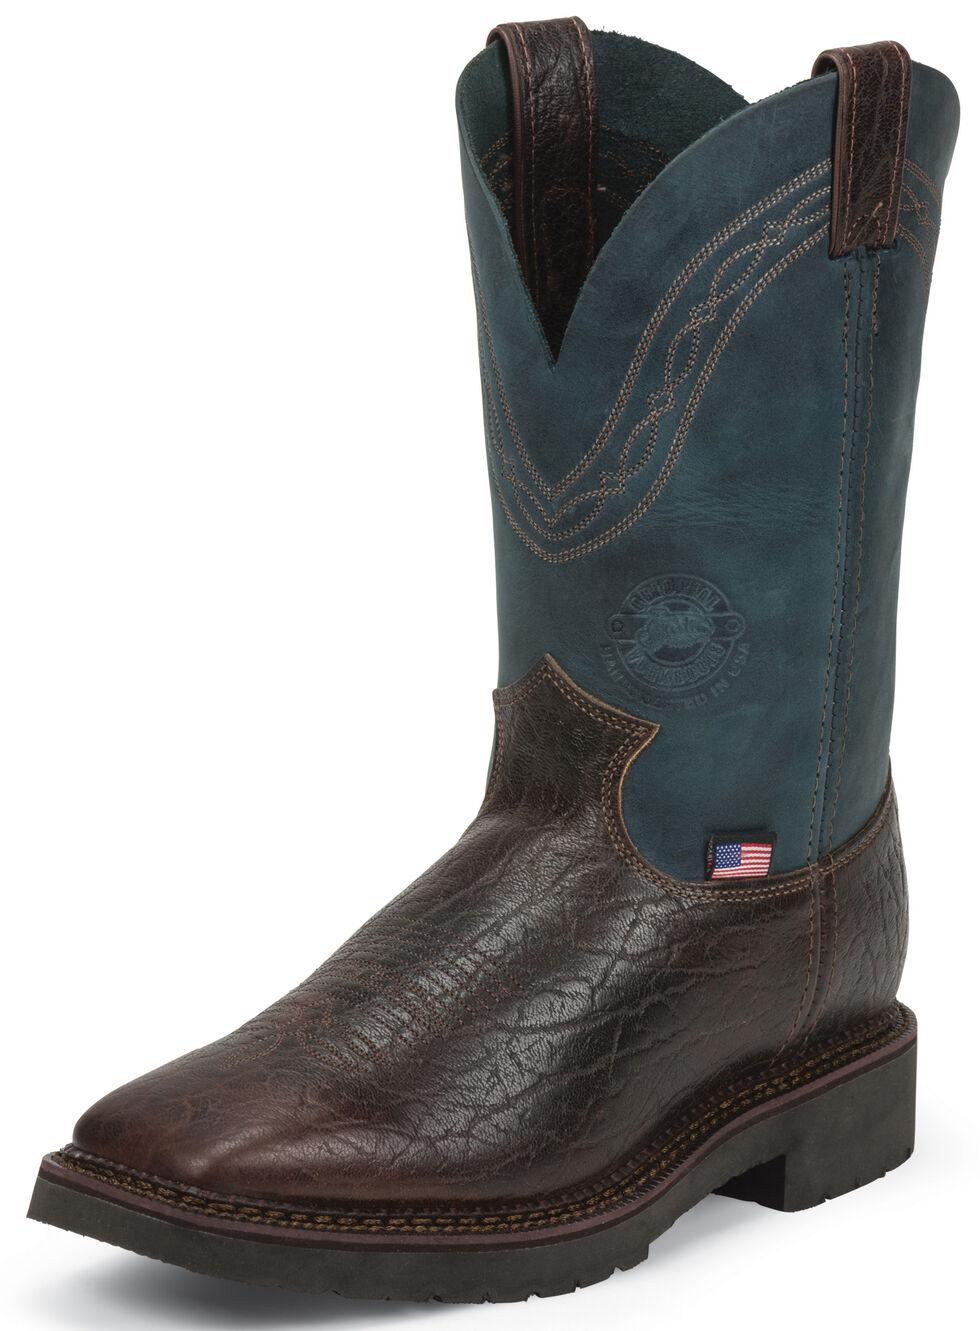 Justin Men's J-Max Caliber Pull-On Work Boots - Steel Toe, Dark Brown, hi-res